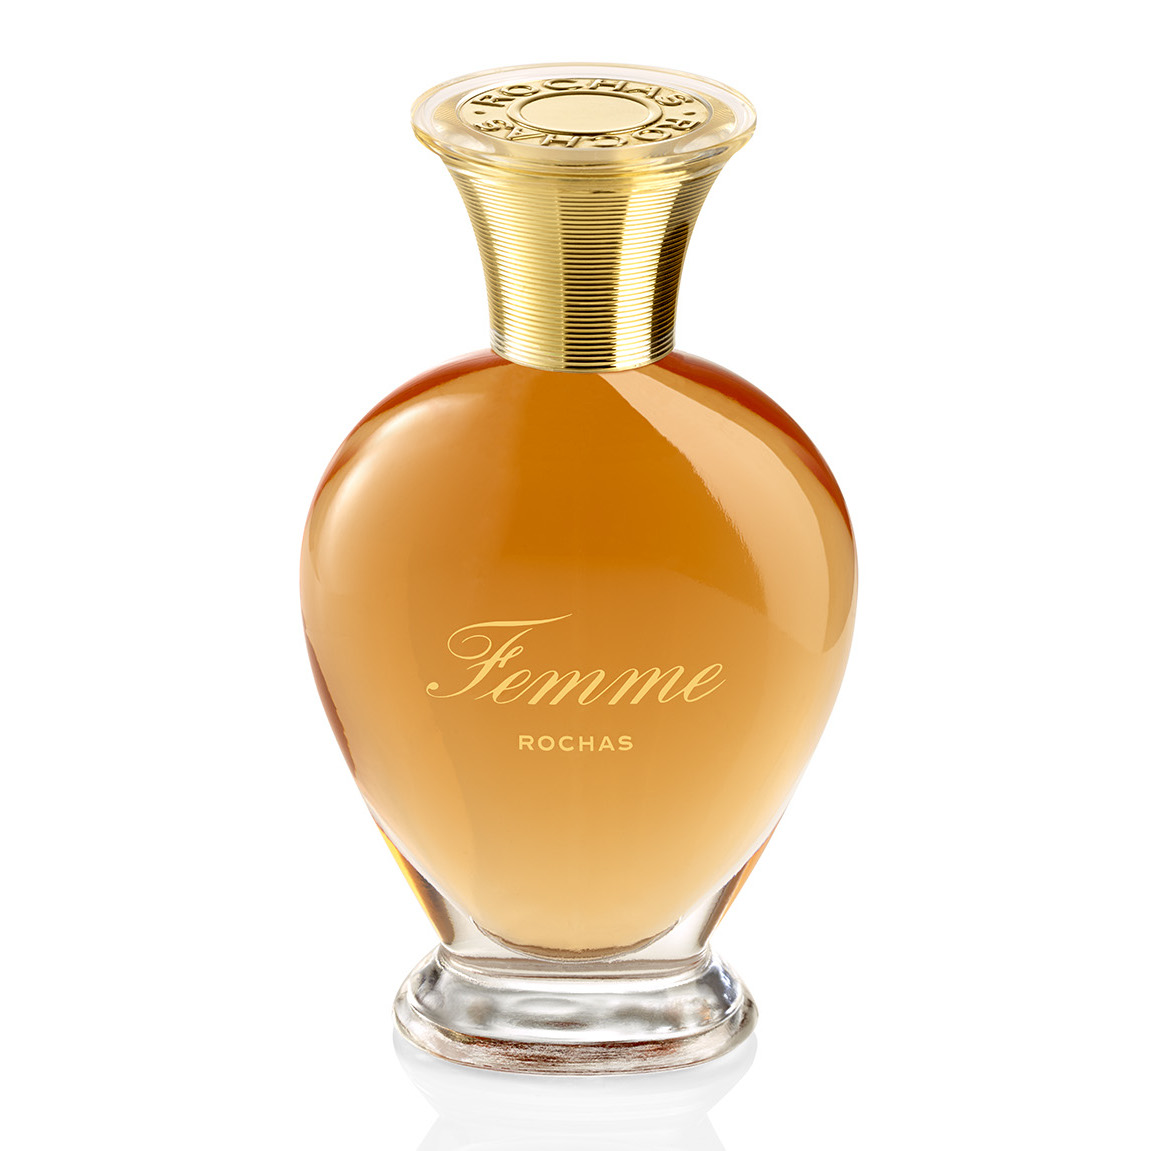 Femme Femme Sephora Femme Parfum Sephora Parfum Rochas Parfum Rochas Parfum Rochas Femme Sephora Rochas JKl1Fc